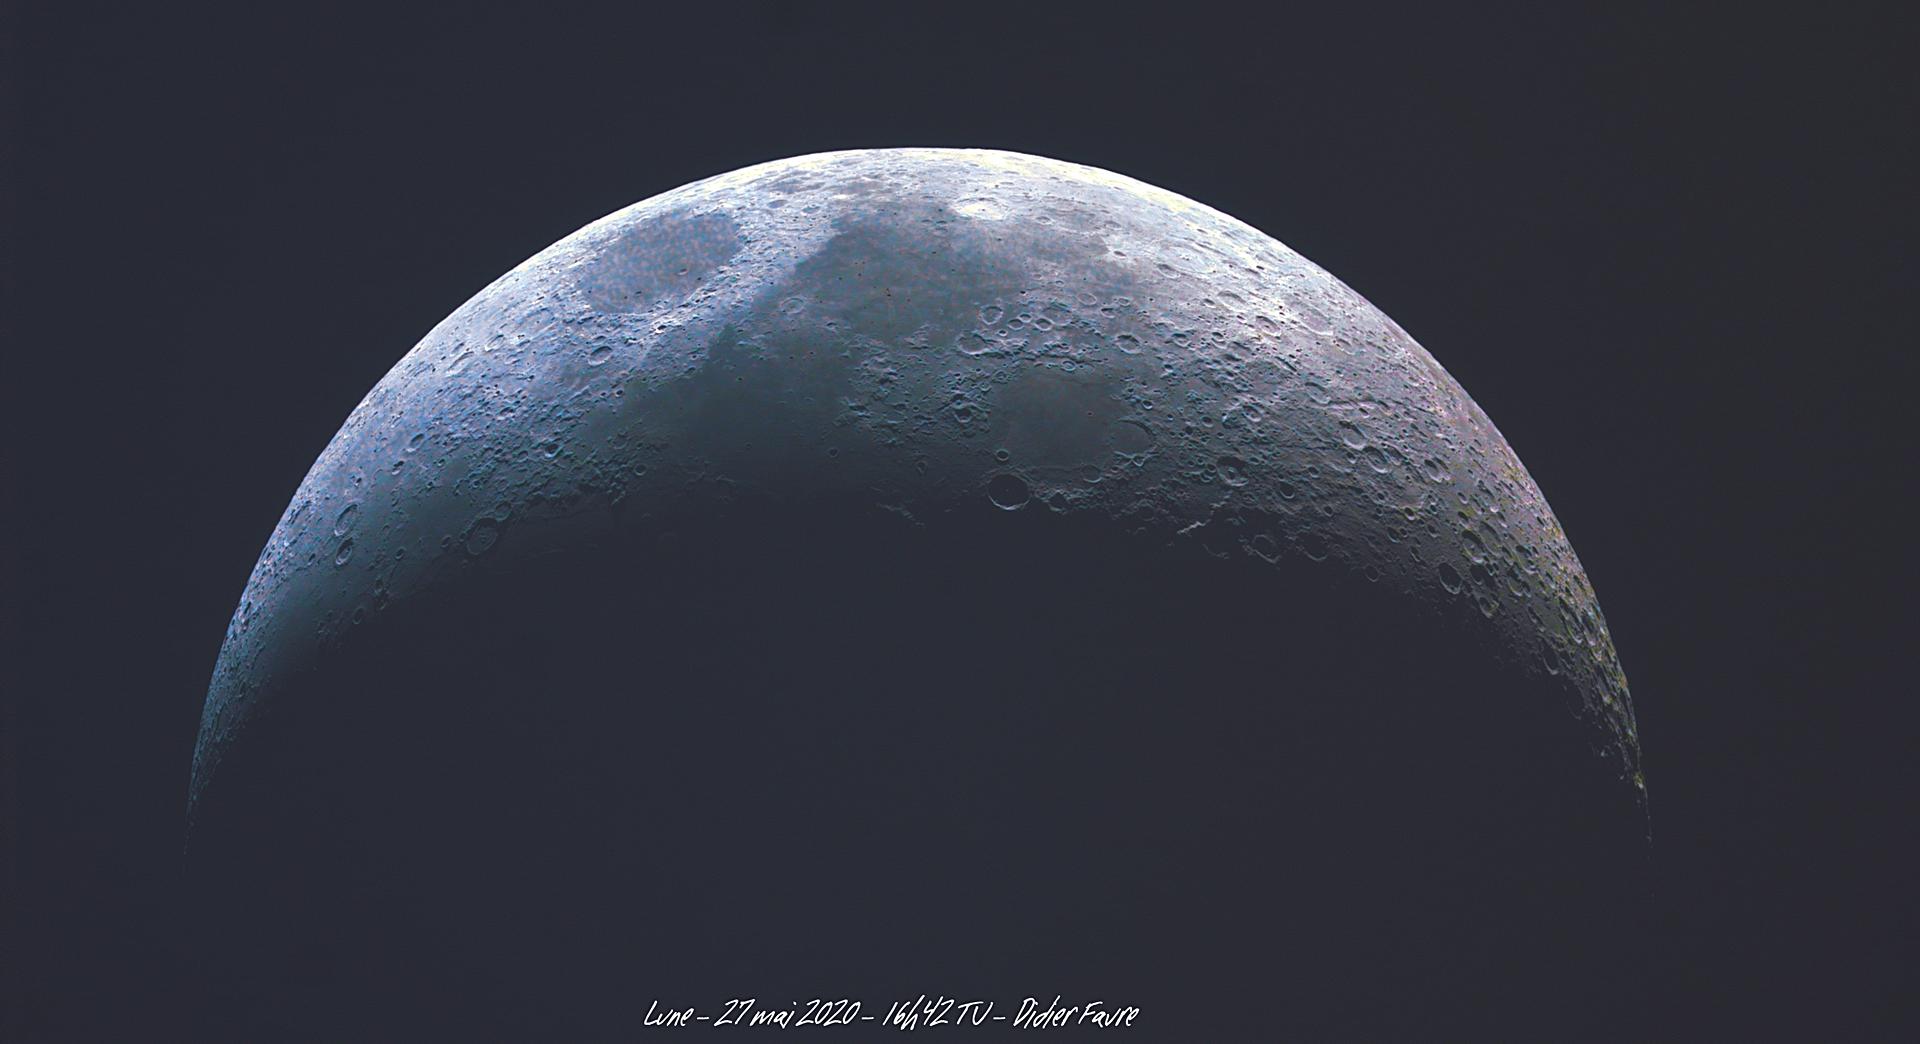 27 mai 2020 - 16h42 TU - Lune  WEB